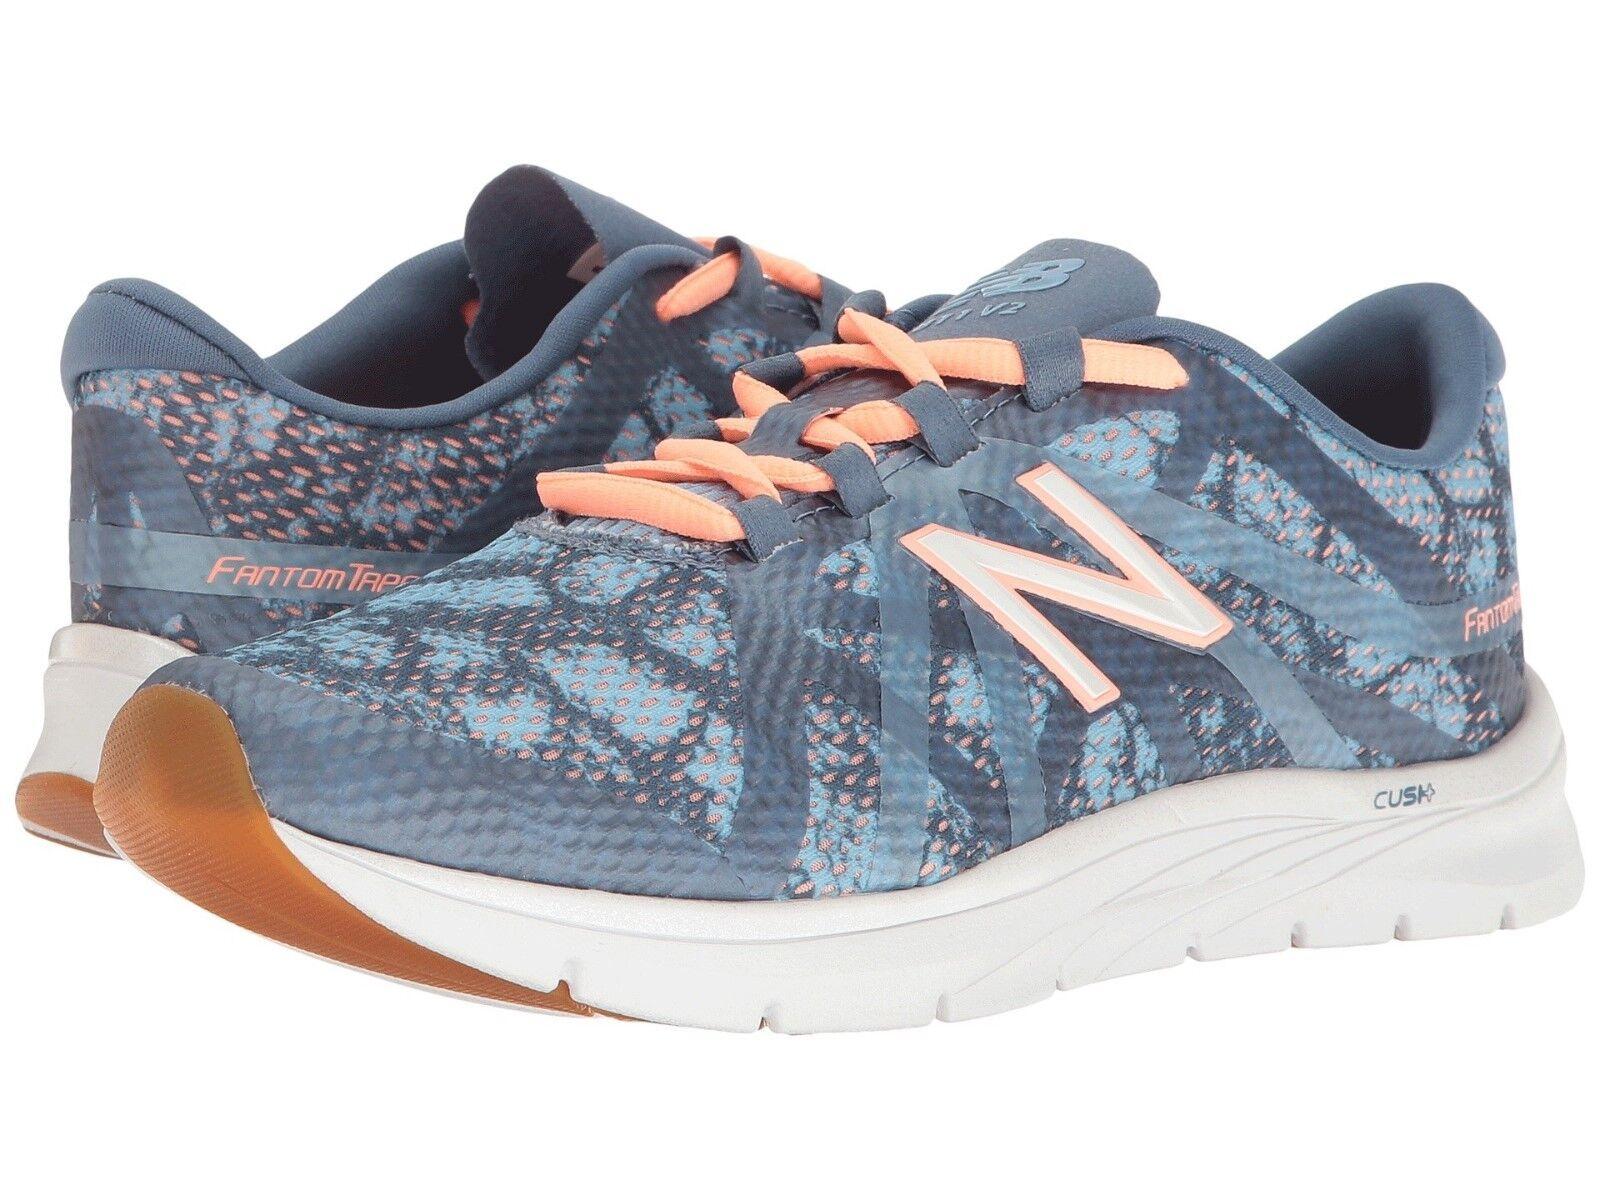 Chaussures Femme New Balance 811v2 Cross-Training Chaussures - 9.5 41 euros-WX811S2 Running